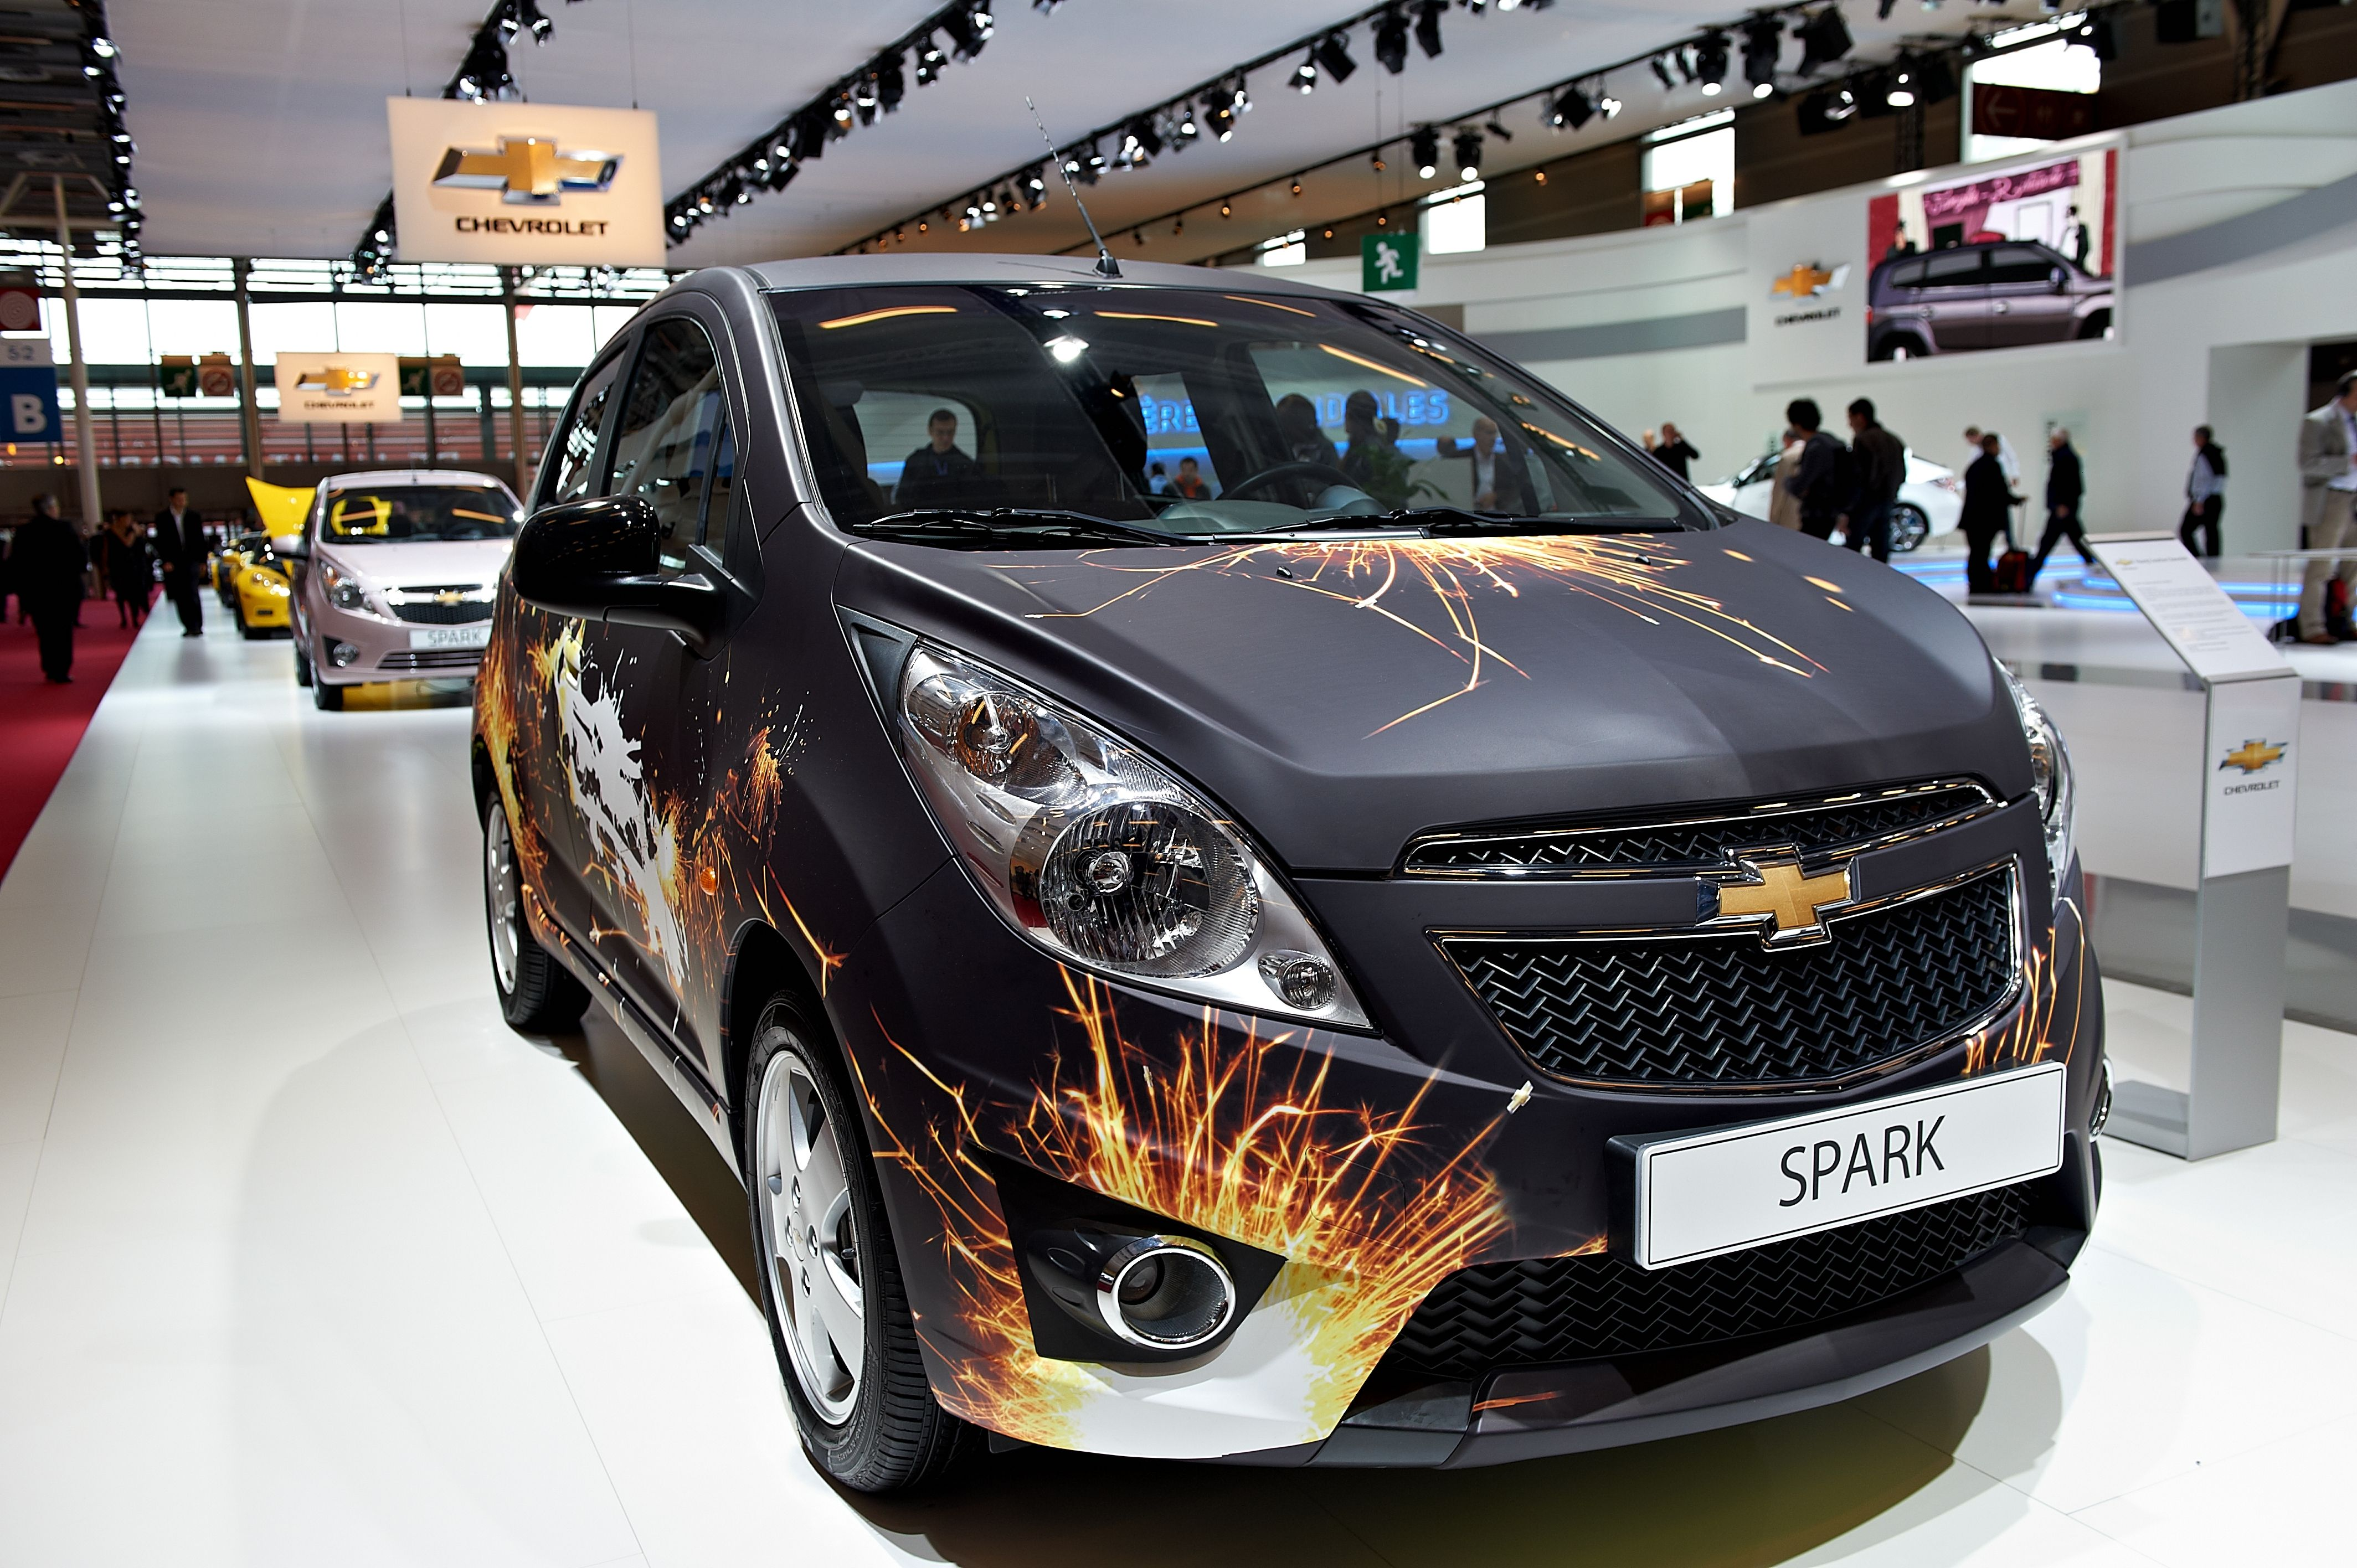 Chevrolet Spark Chevrolet Spark Chevrolet Chevy